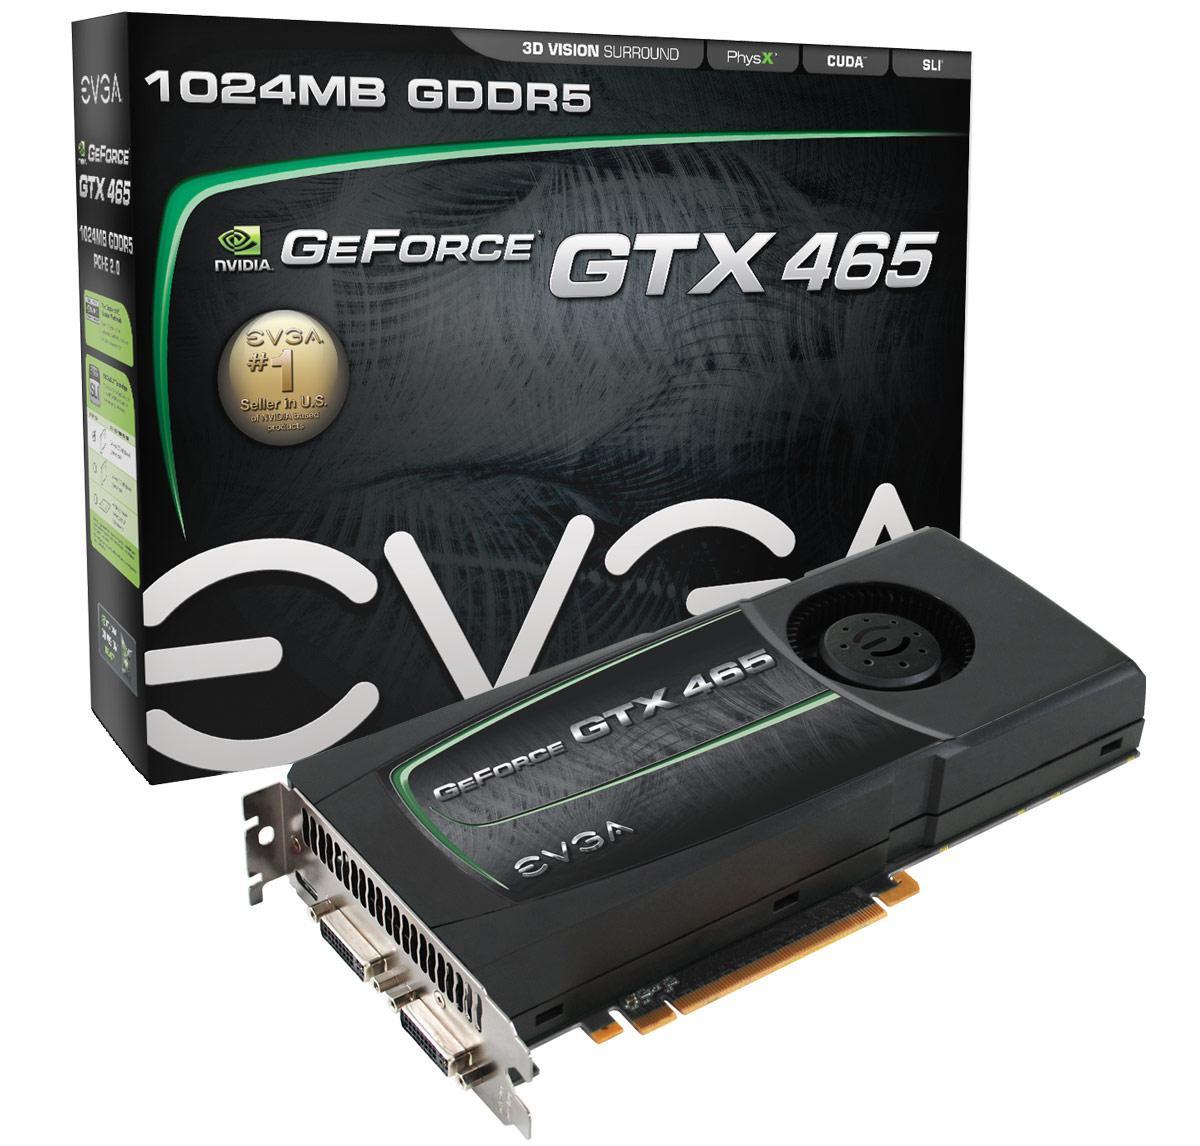 EVGA社制NVIDIA Geforce GTX465搭载制品発表